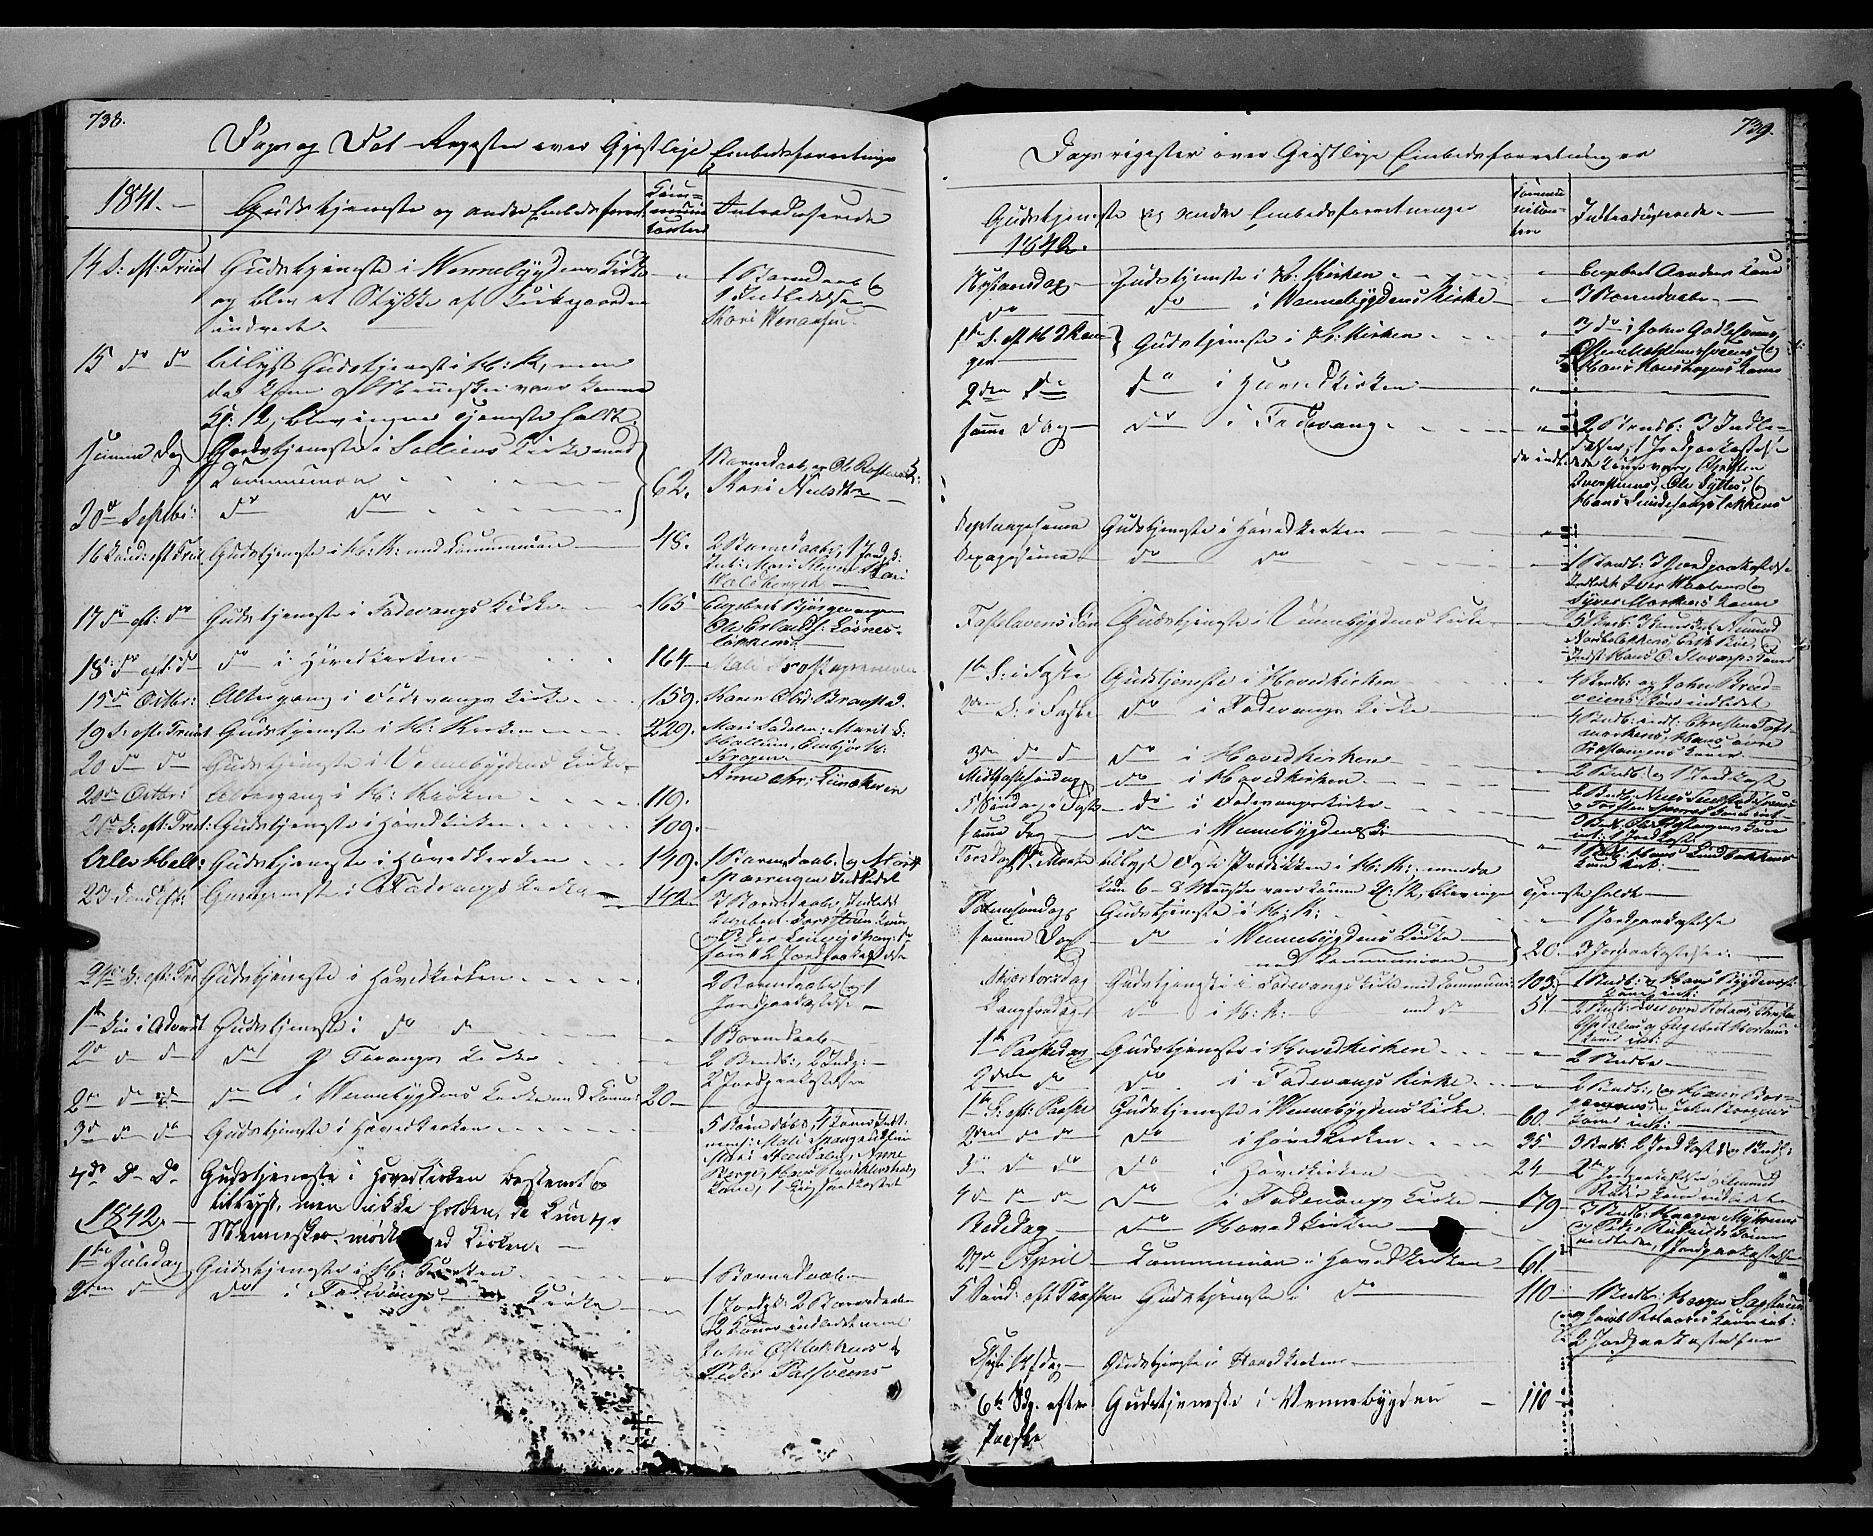 SAH, Ringebu prestekontor, Ministerialbok nr. 5, 1839-1848, s. 738-739